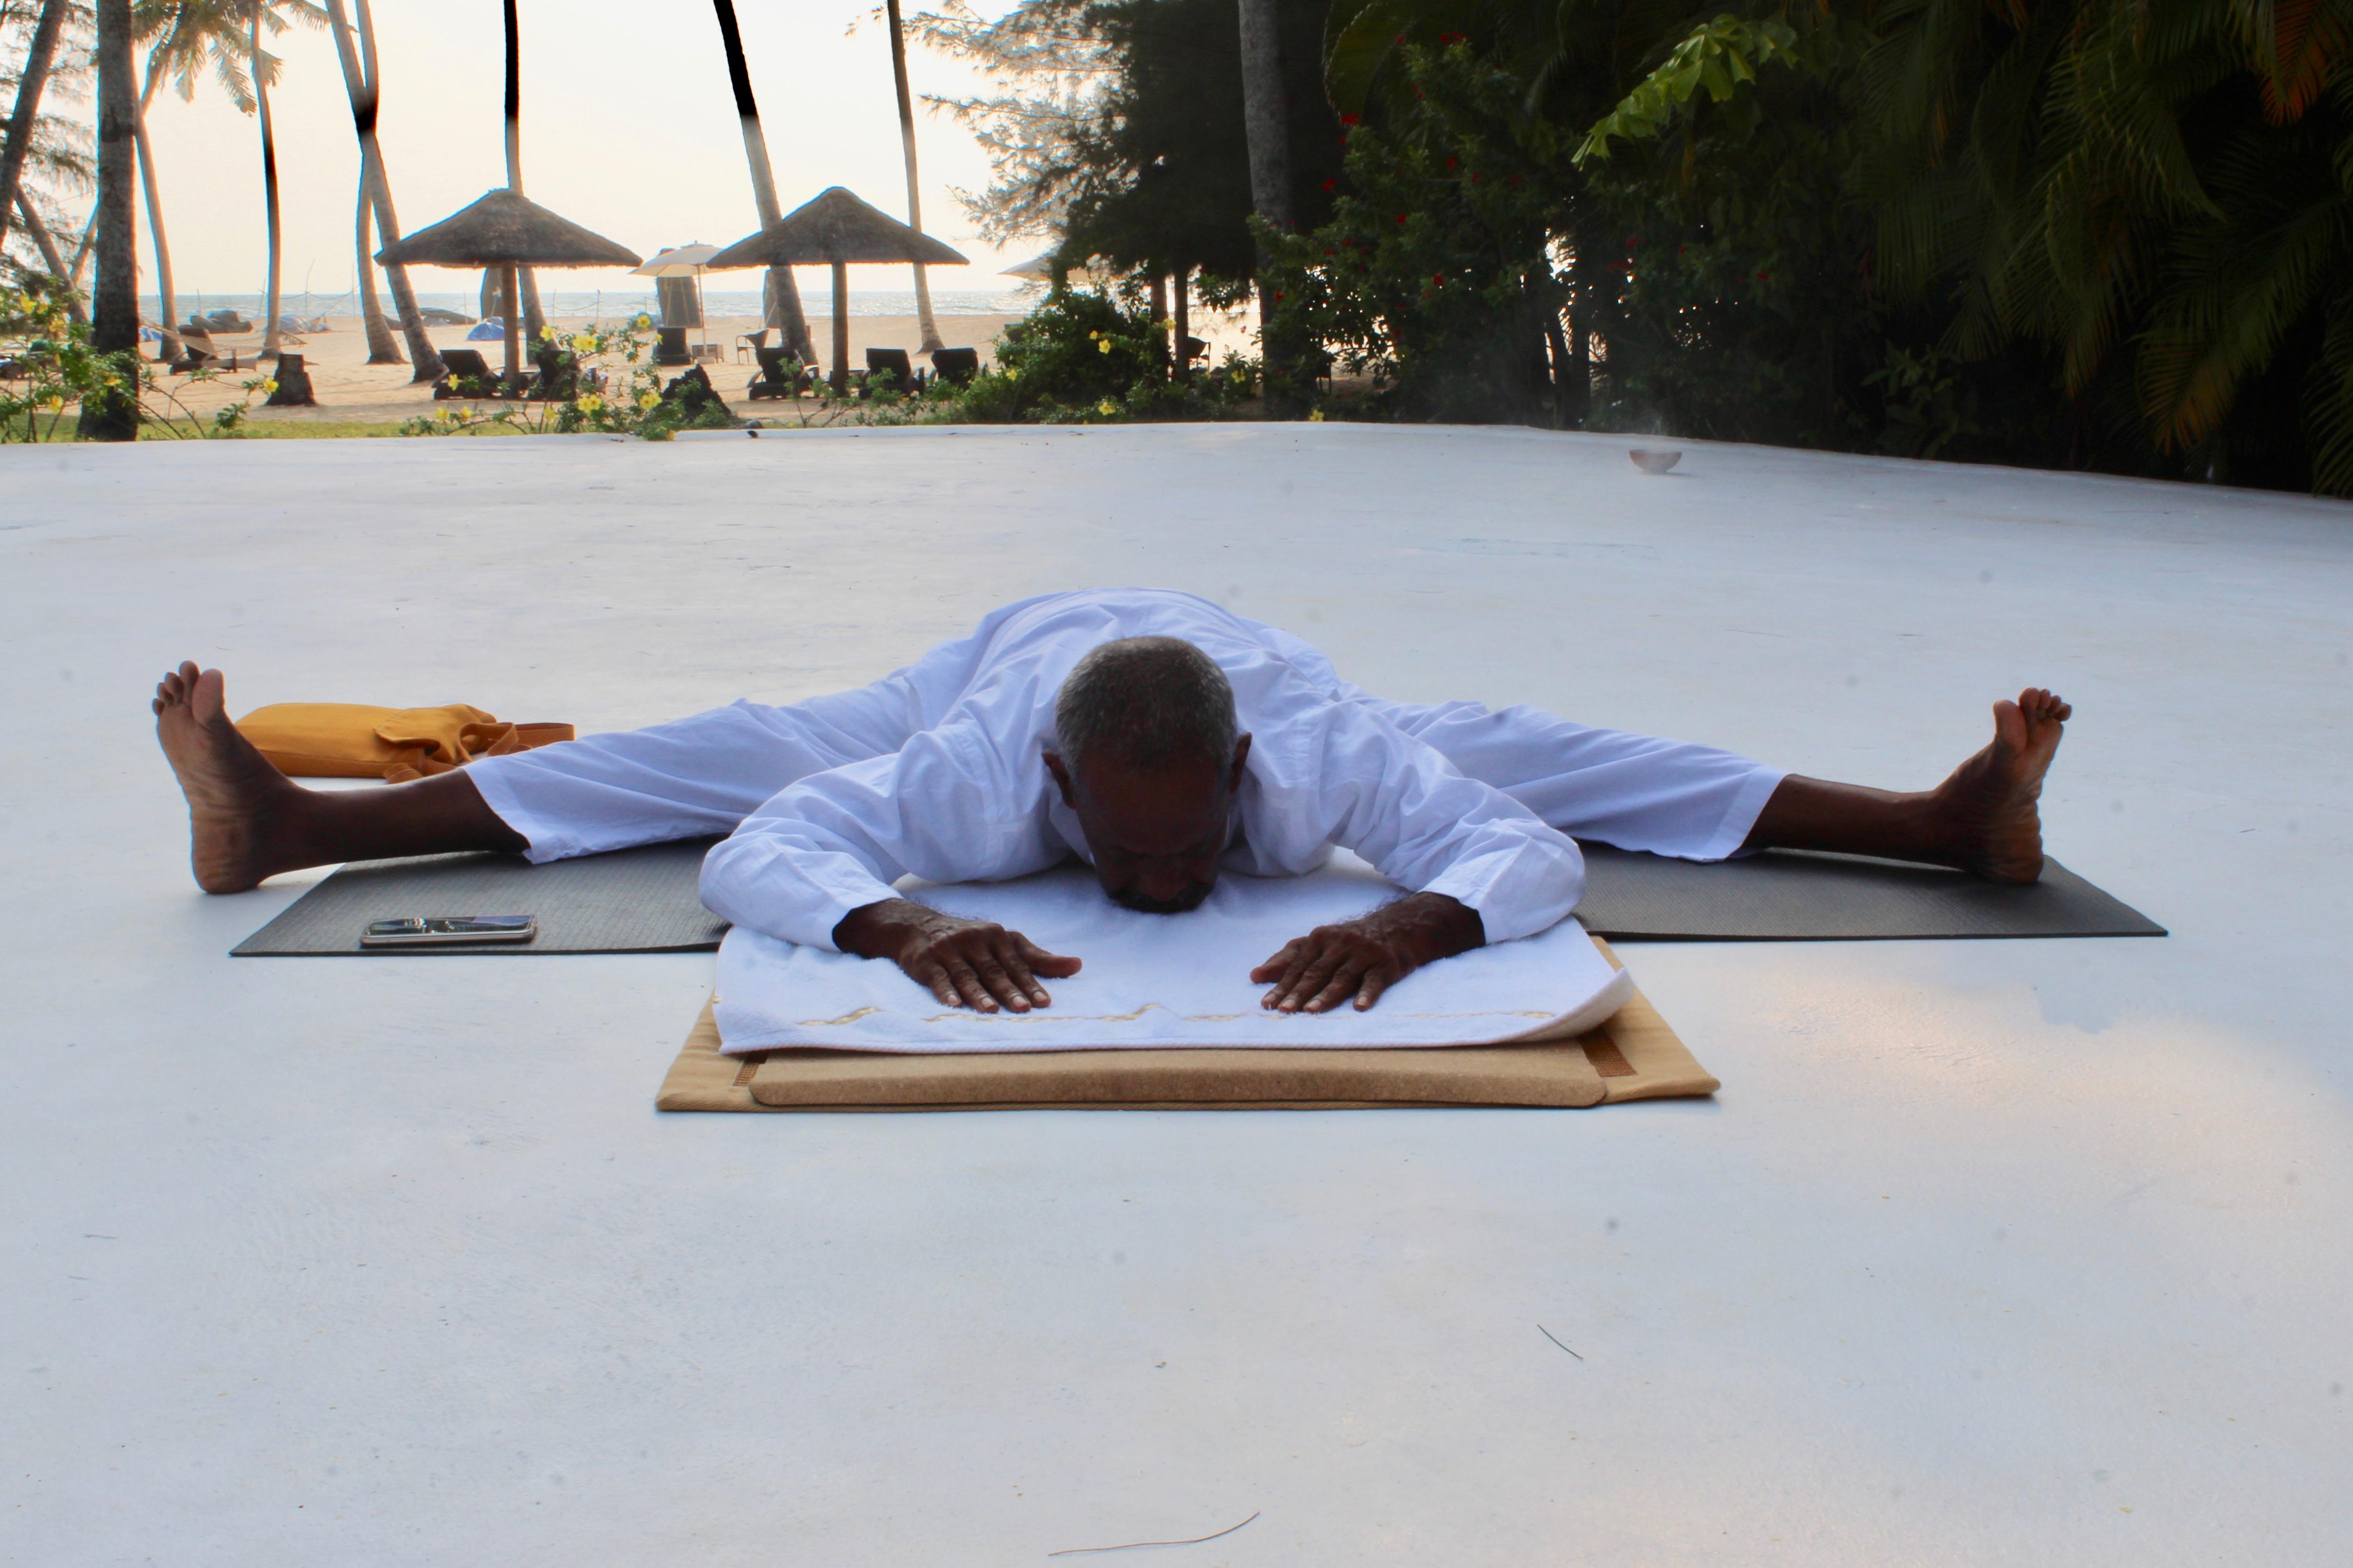 2019 - Mararikulam North, Kerala, India - Carnoustie Ayurvedic & Wellness Resort - Yoga Instructor Gopal, 74 years of awesome!